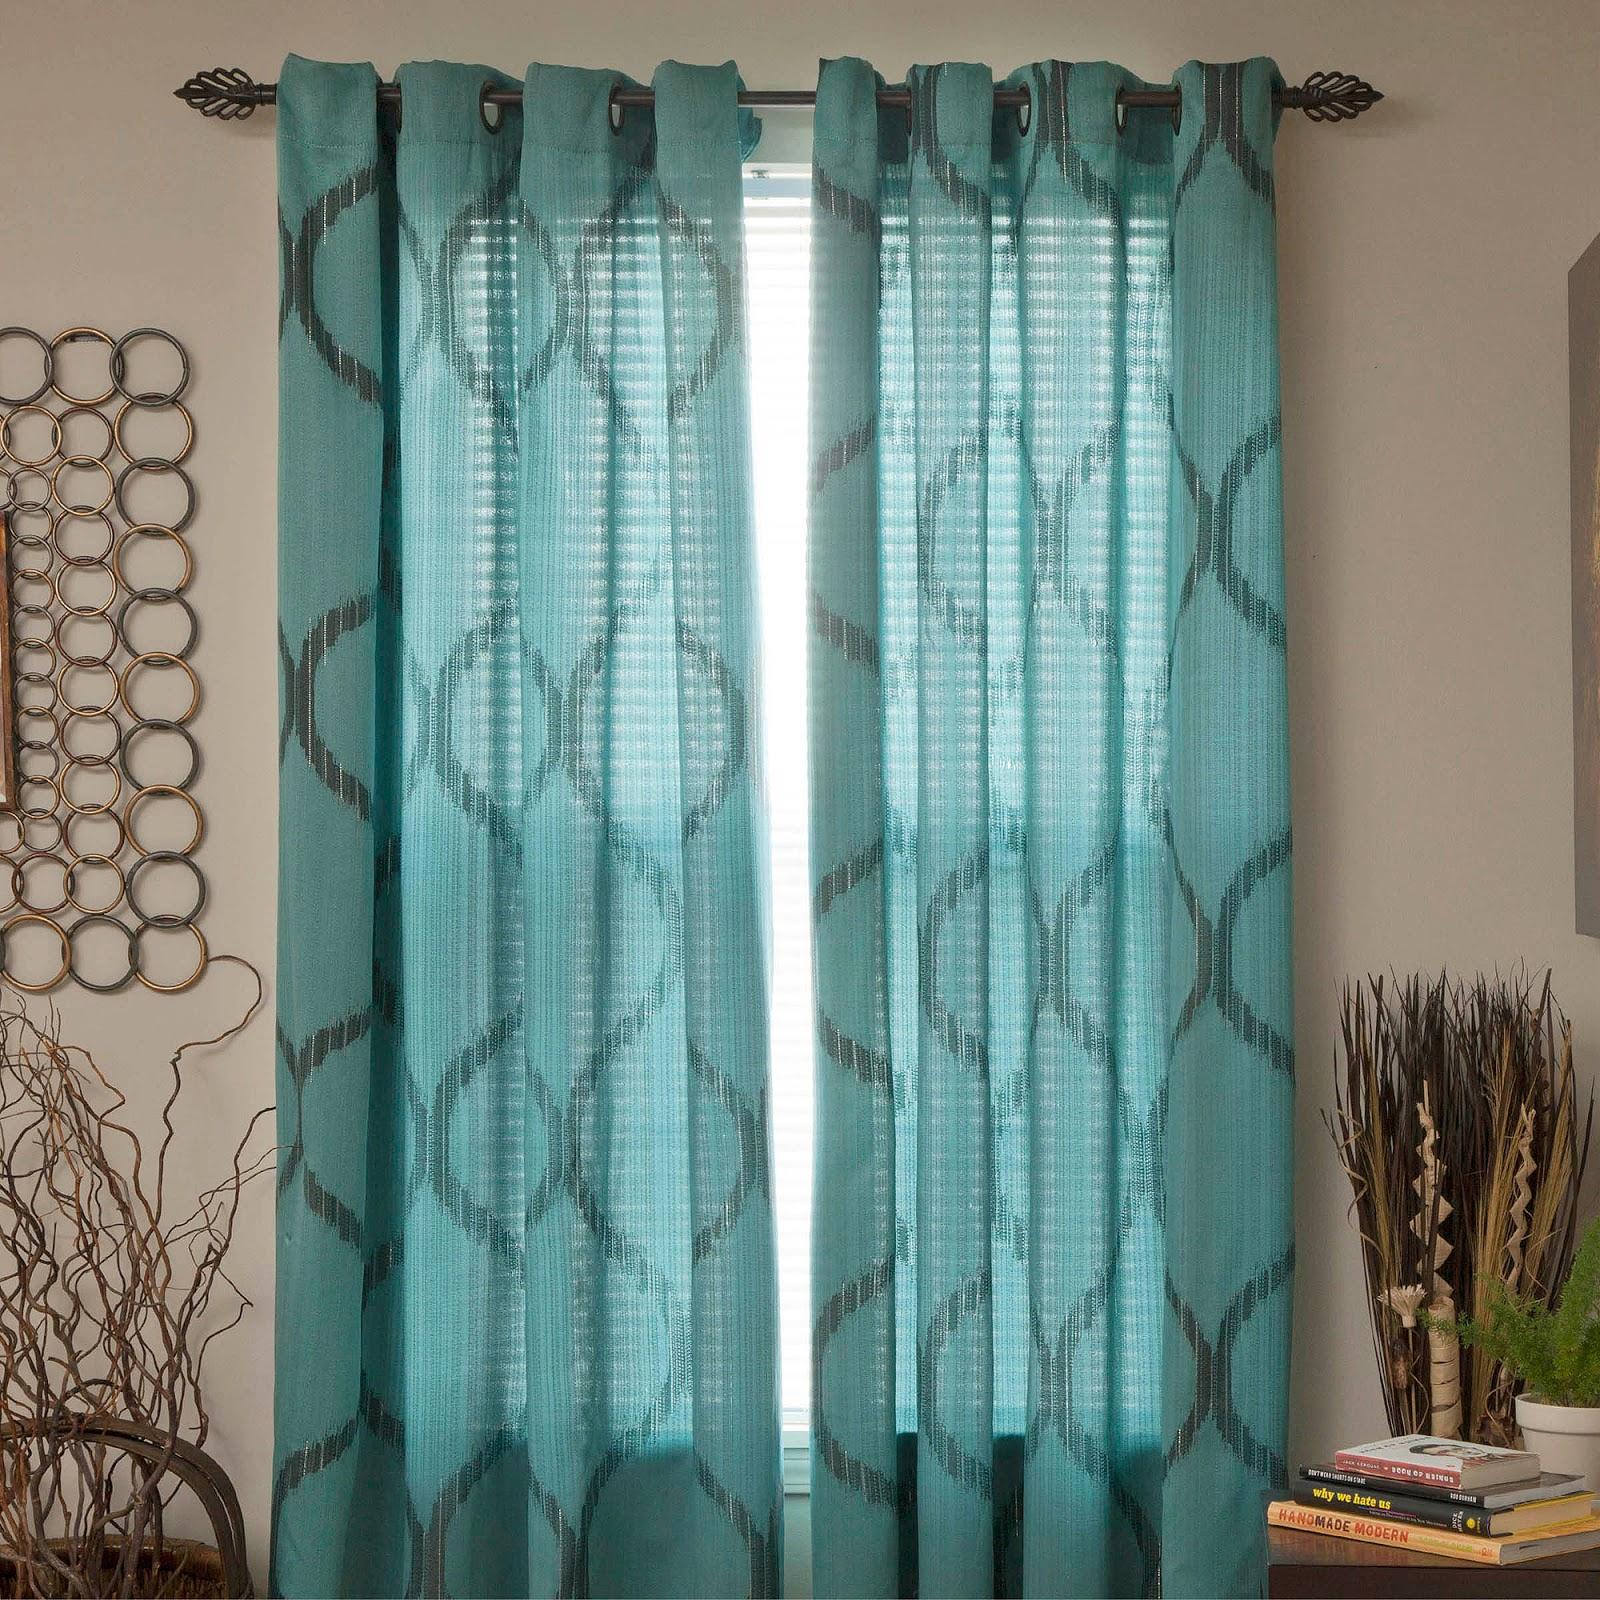 Curtains For Studio Apartments Sun Porch Sunroom Tall Windows Teenage Bedrooms